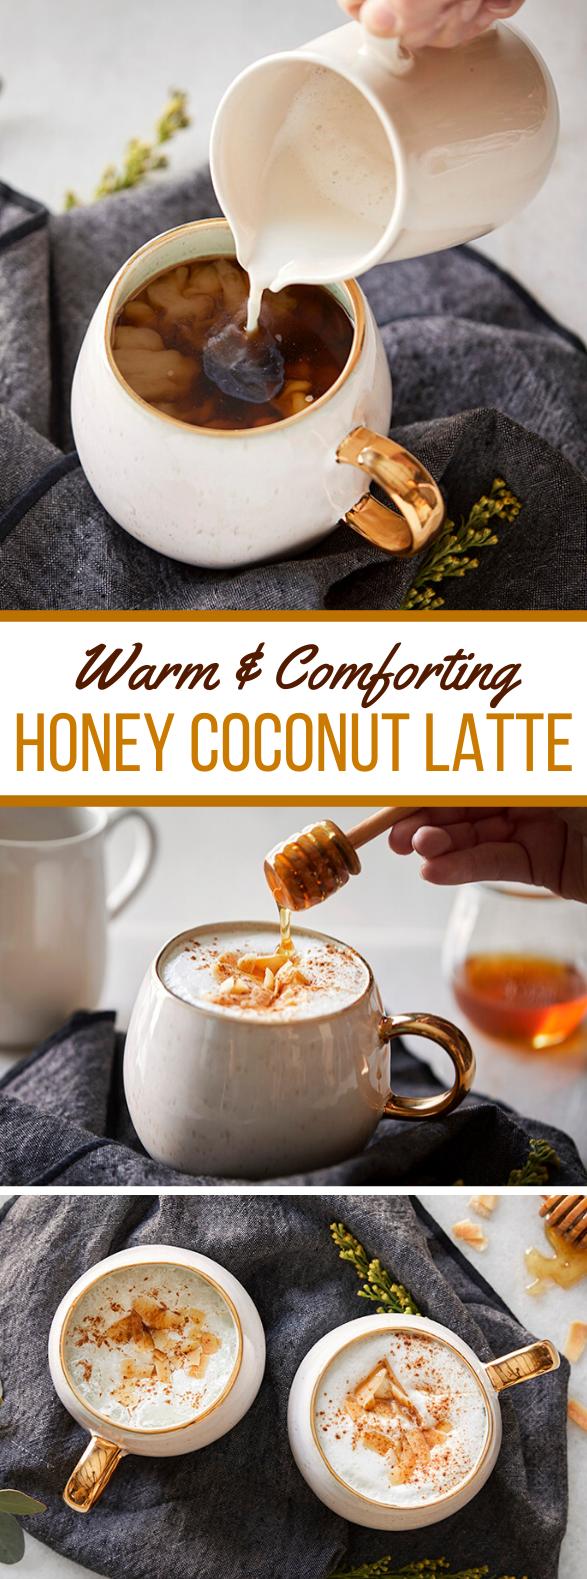 Honey Coconut Latte #drinks #hotdrink